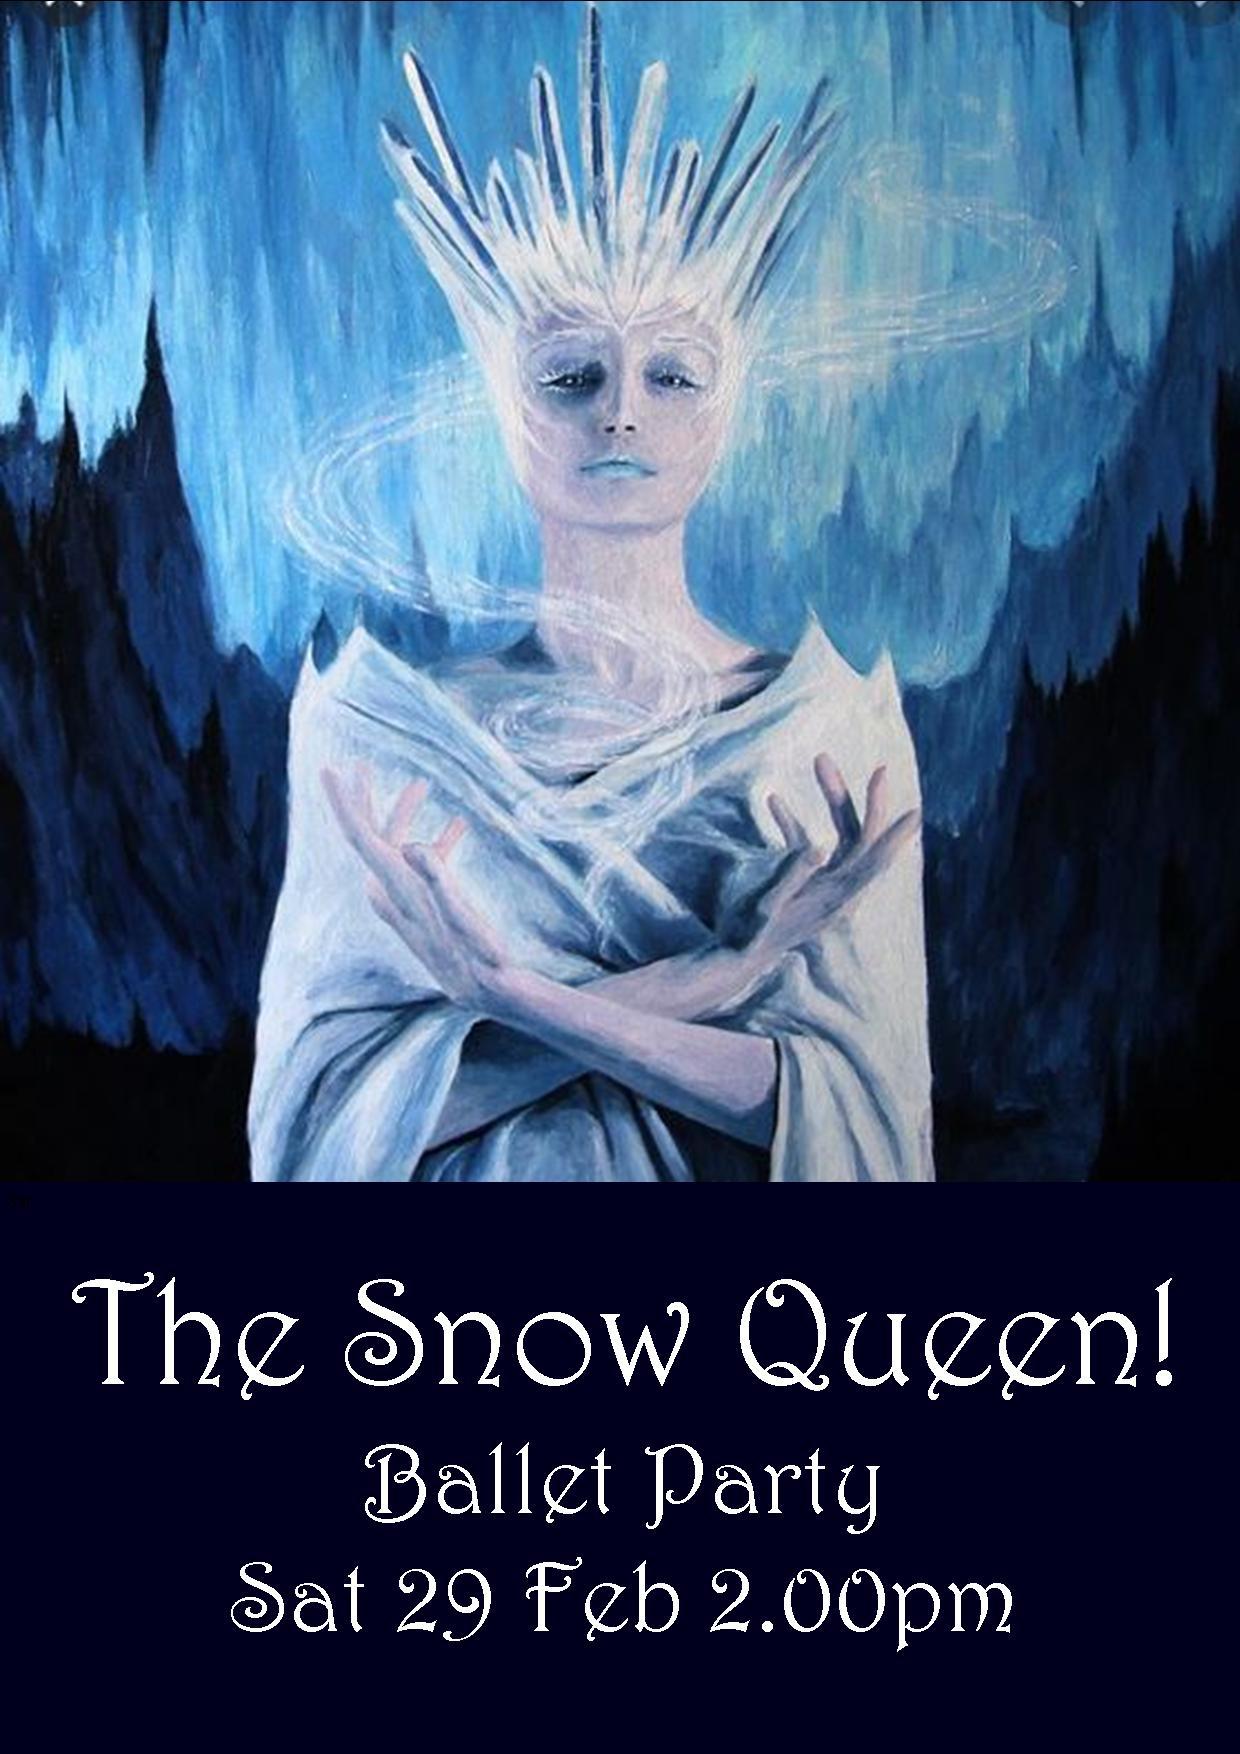 THE SNOW QUEEN BALLET PARTY SAT 29 FEB 2.00PM